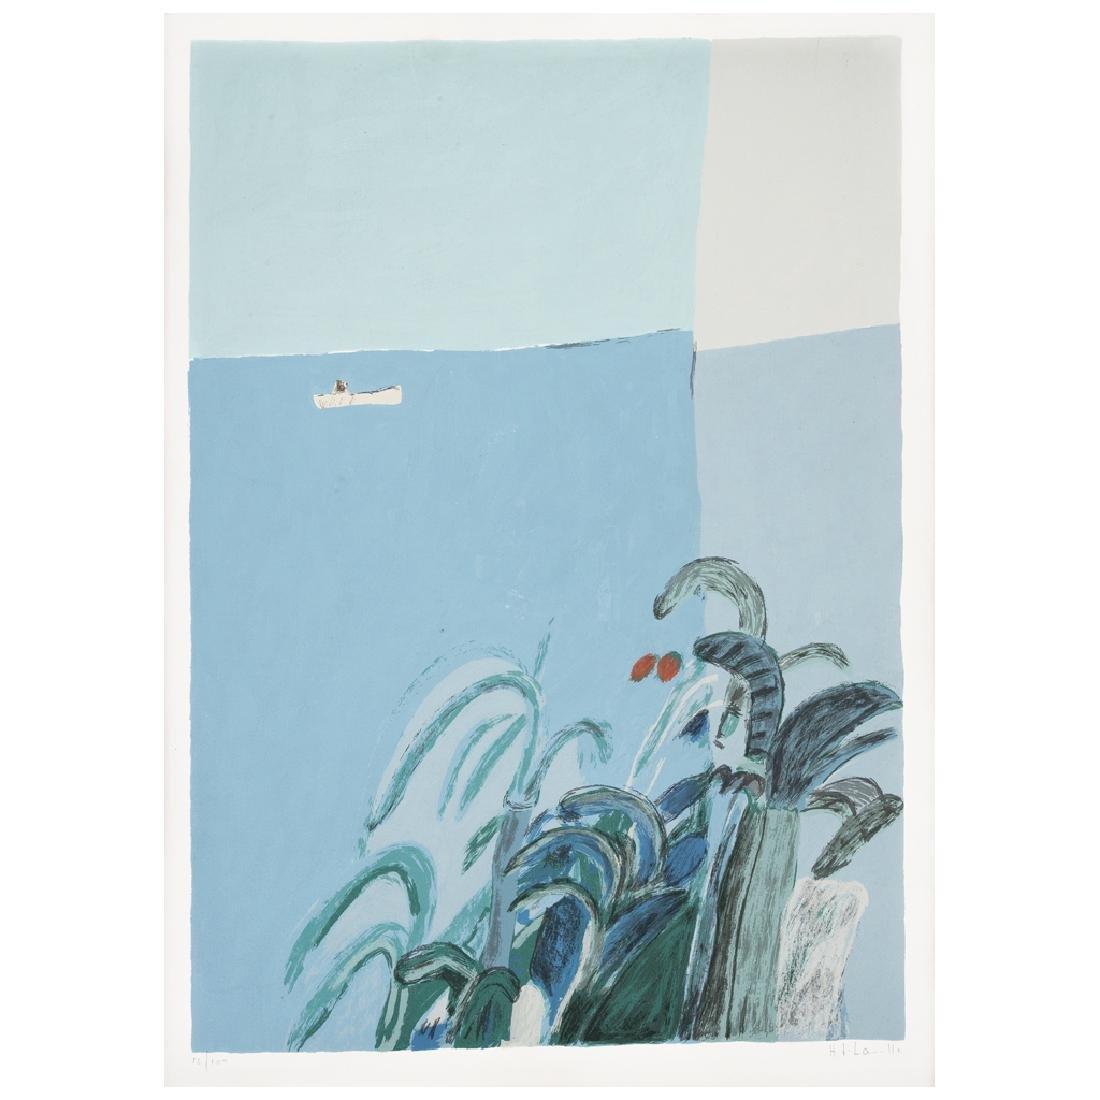 JOY LAVILLE, Untitled, Signed. Litograph 12/100, 55 x